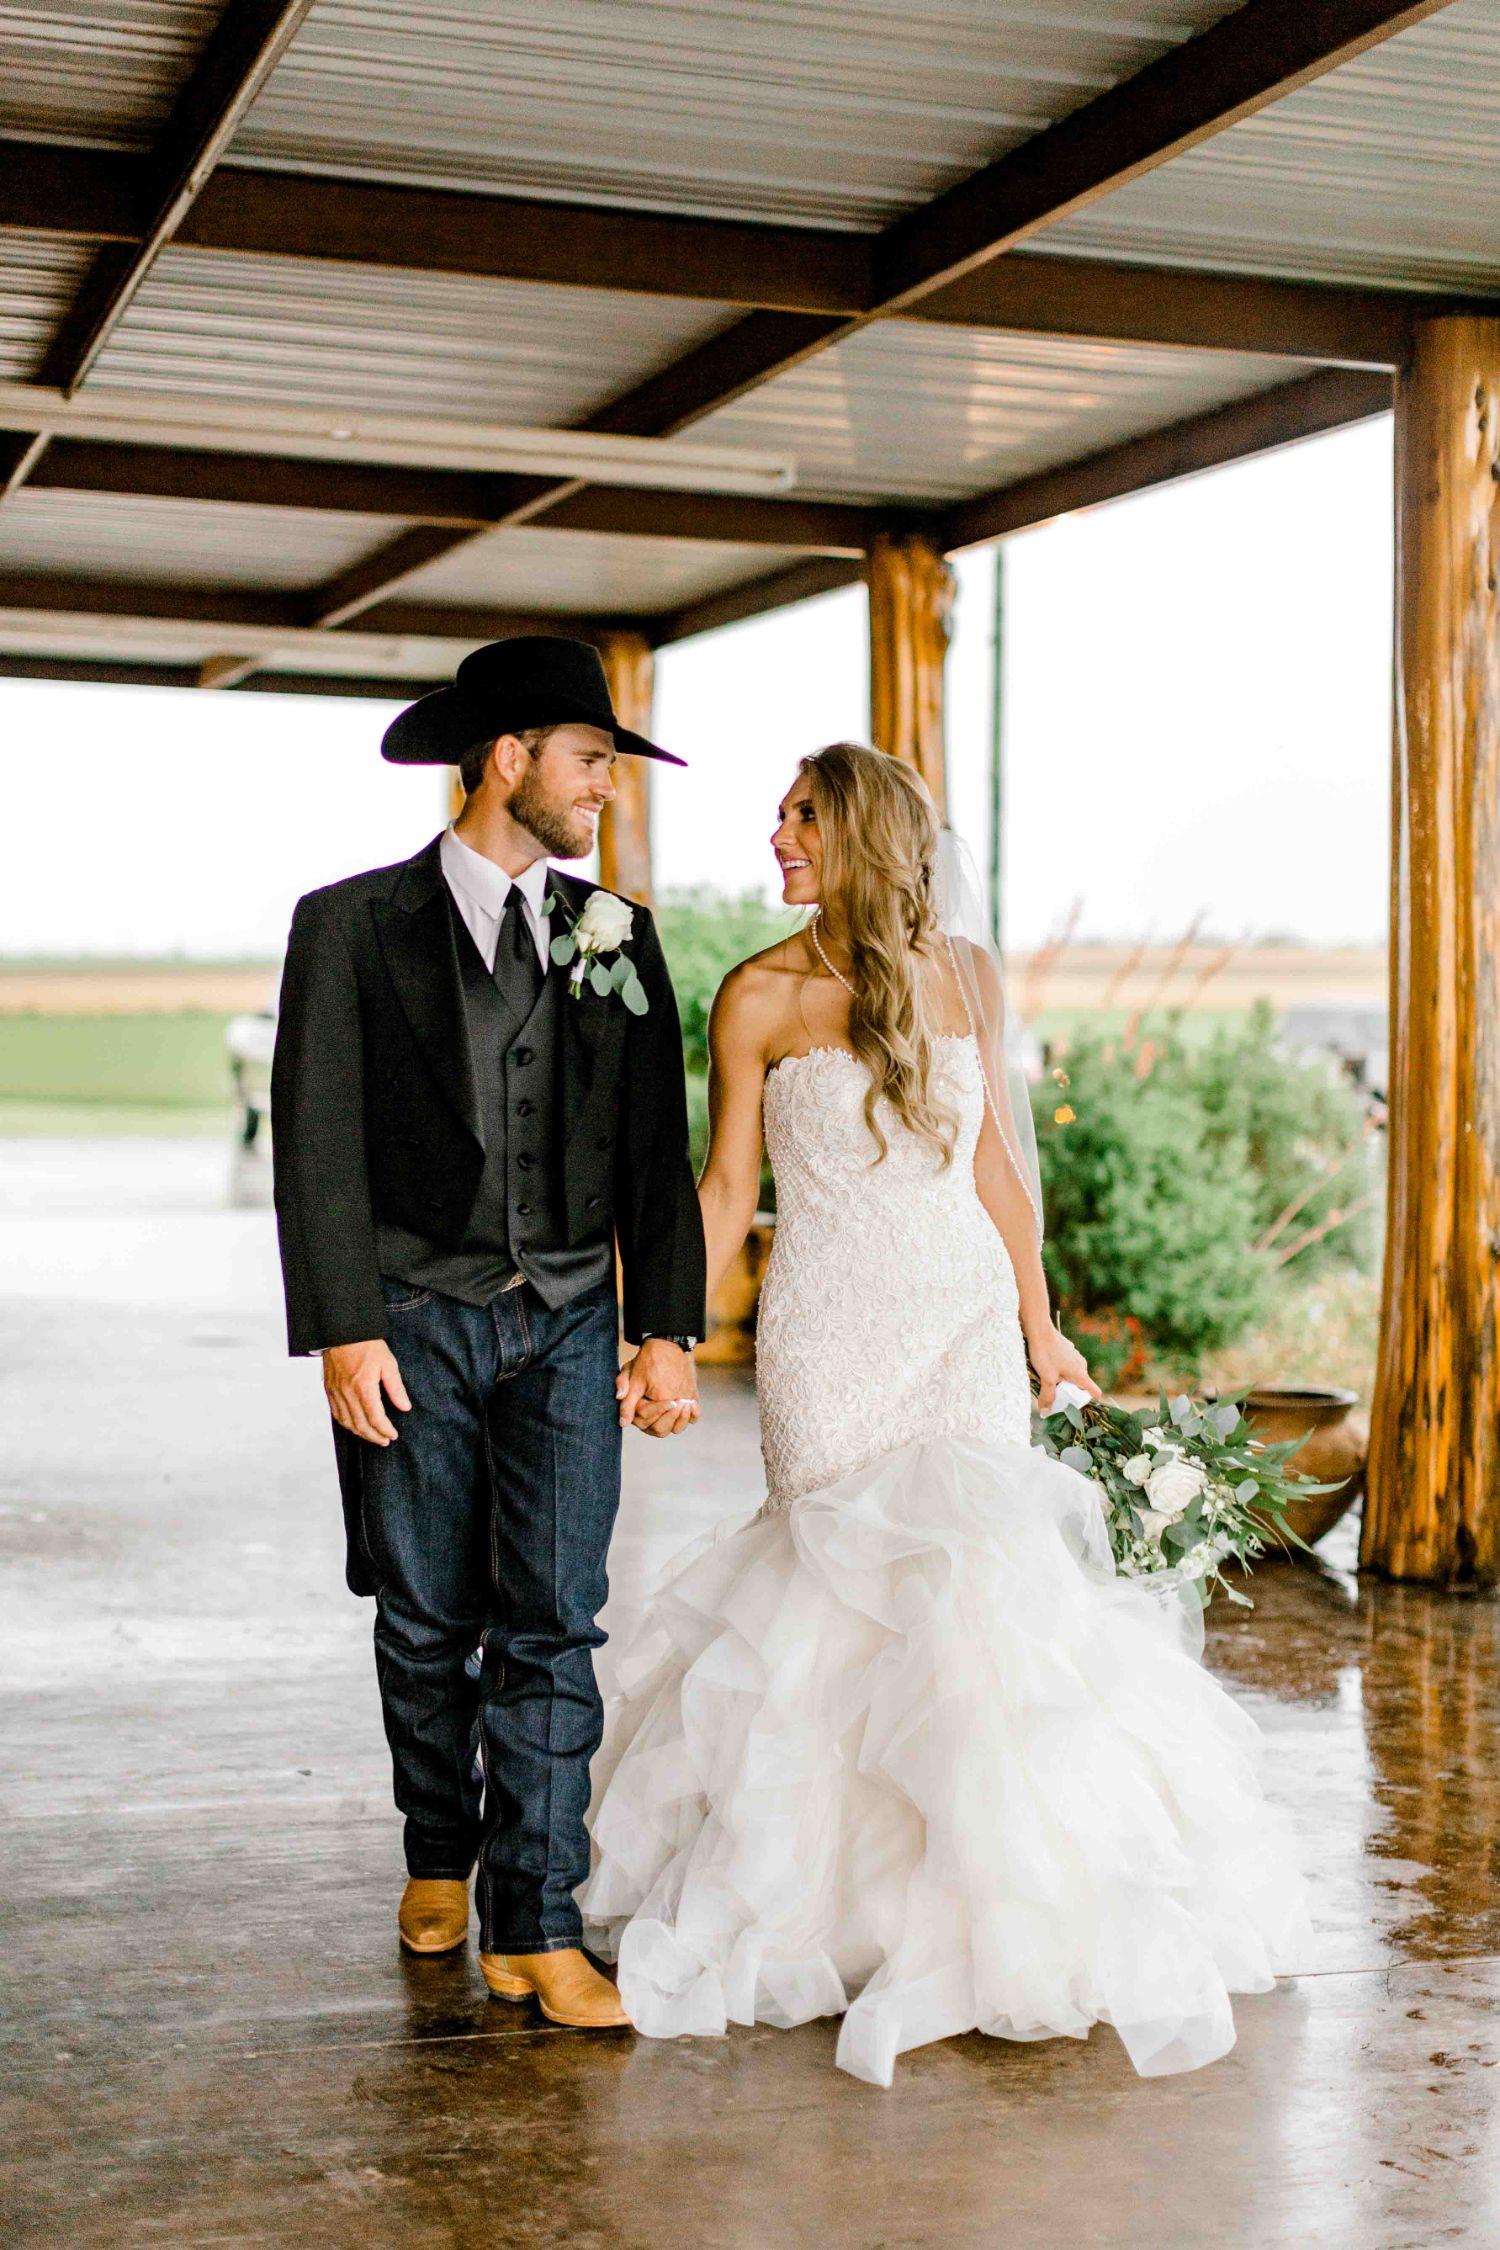 wichita-falls-wedding-katelyn-colten-vernon-texas-32.jpg